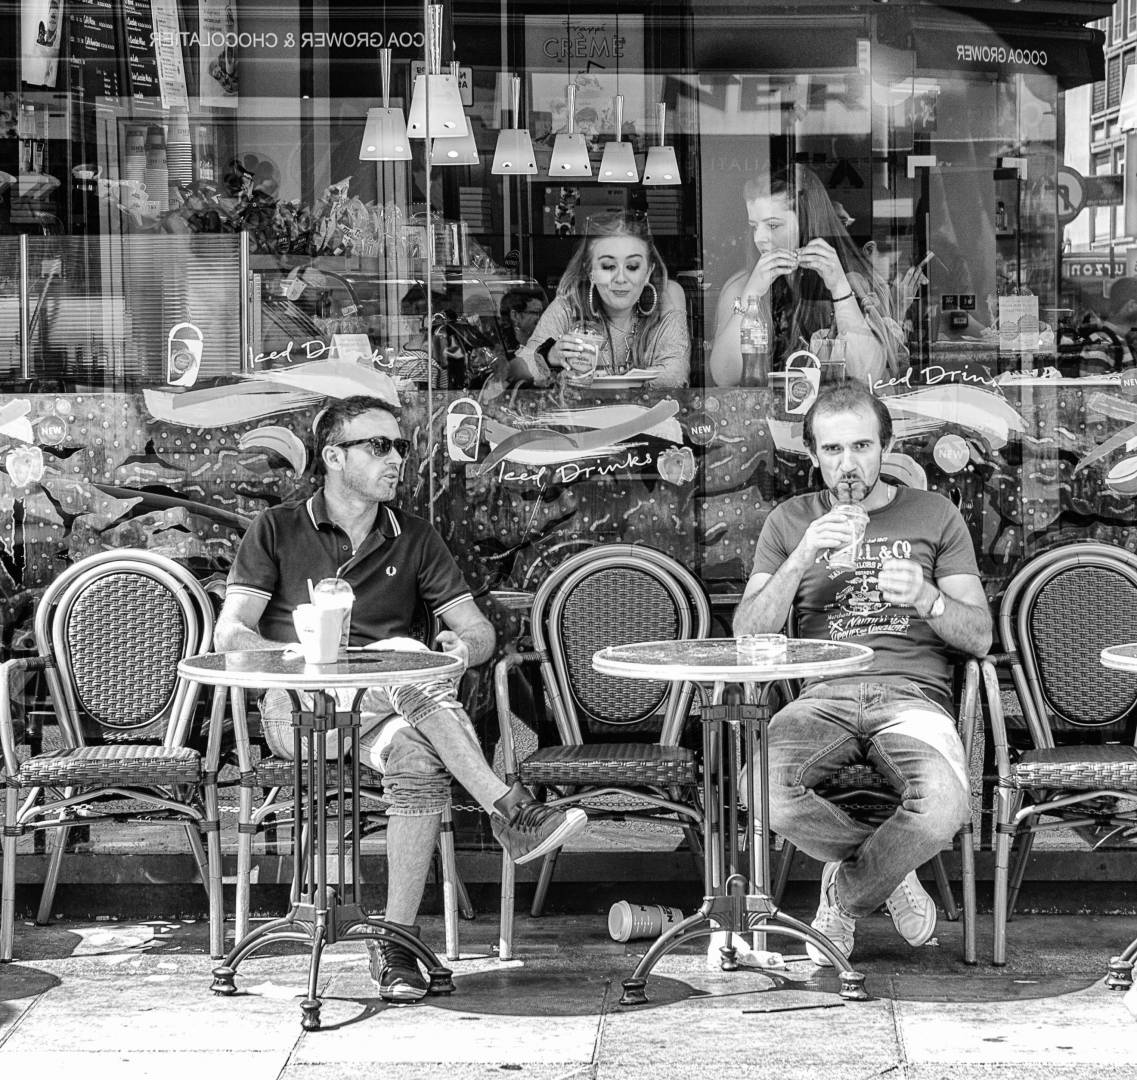 Soho Cafe with the Leica Monochrom, Mark I. Image Mike Evans